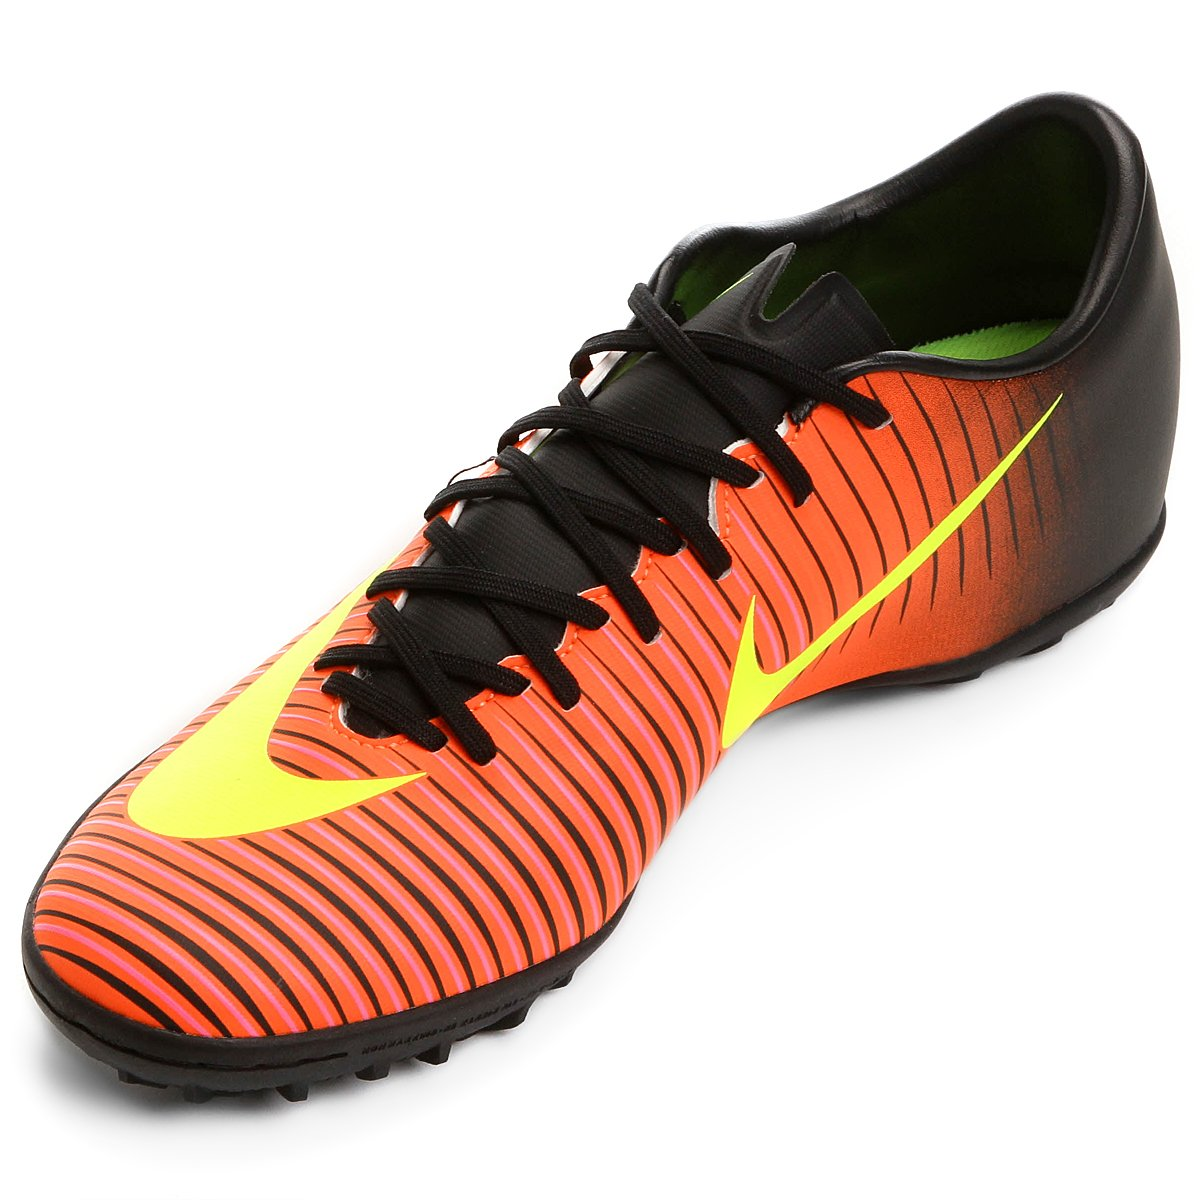 Chuteira Society Nike Mercurial Victory 6 TF - Laranja e Preto ... 4661535ce6c4d